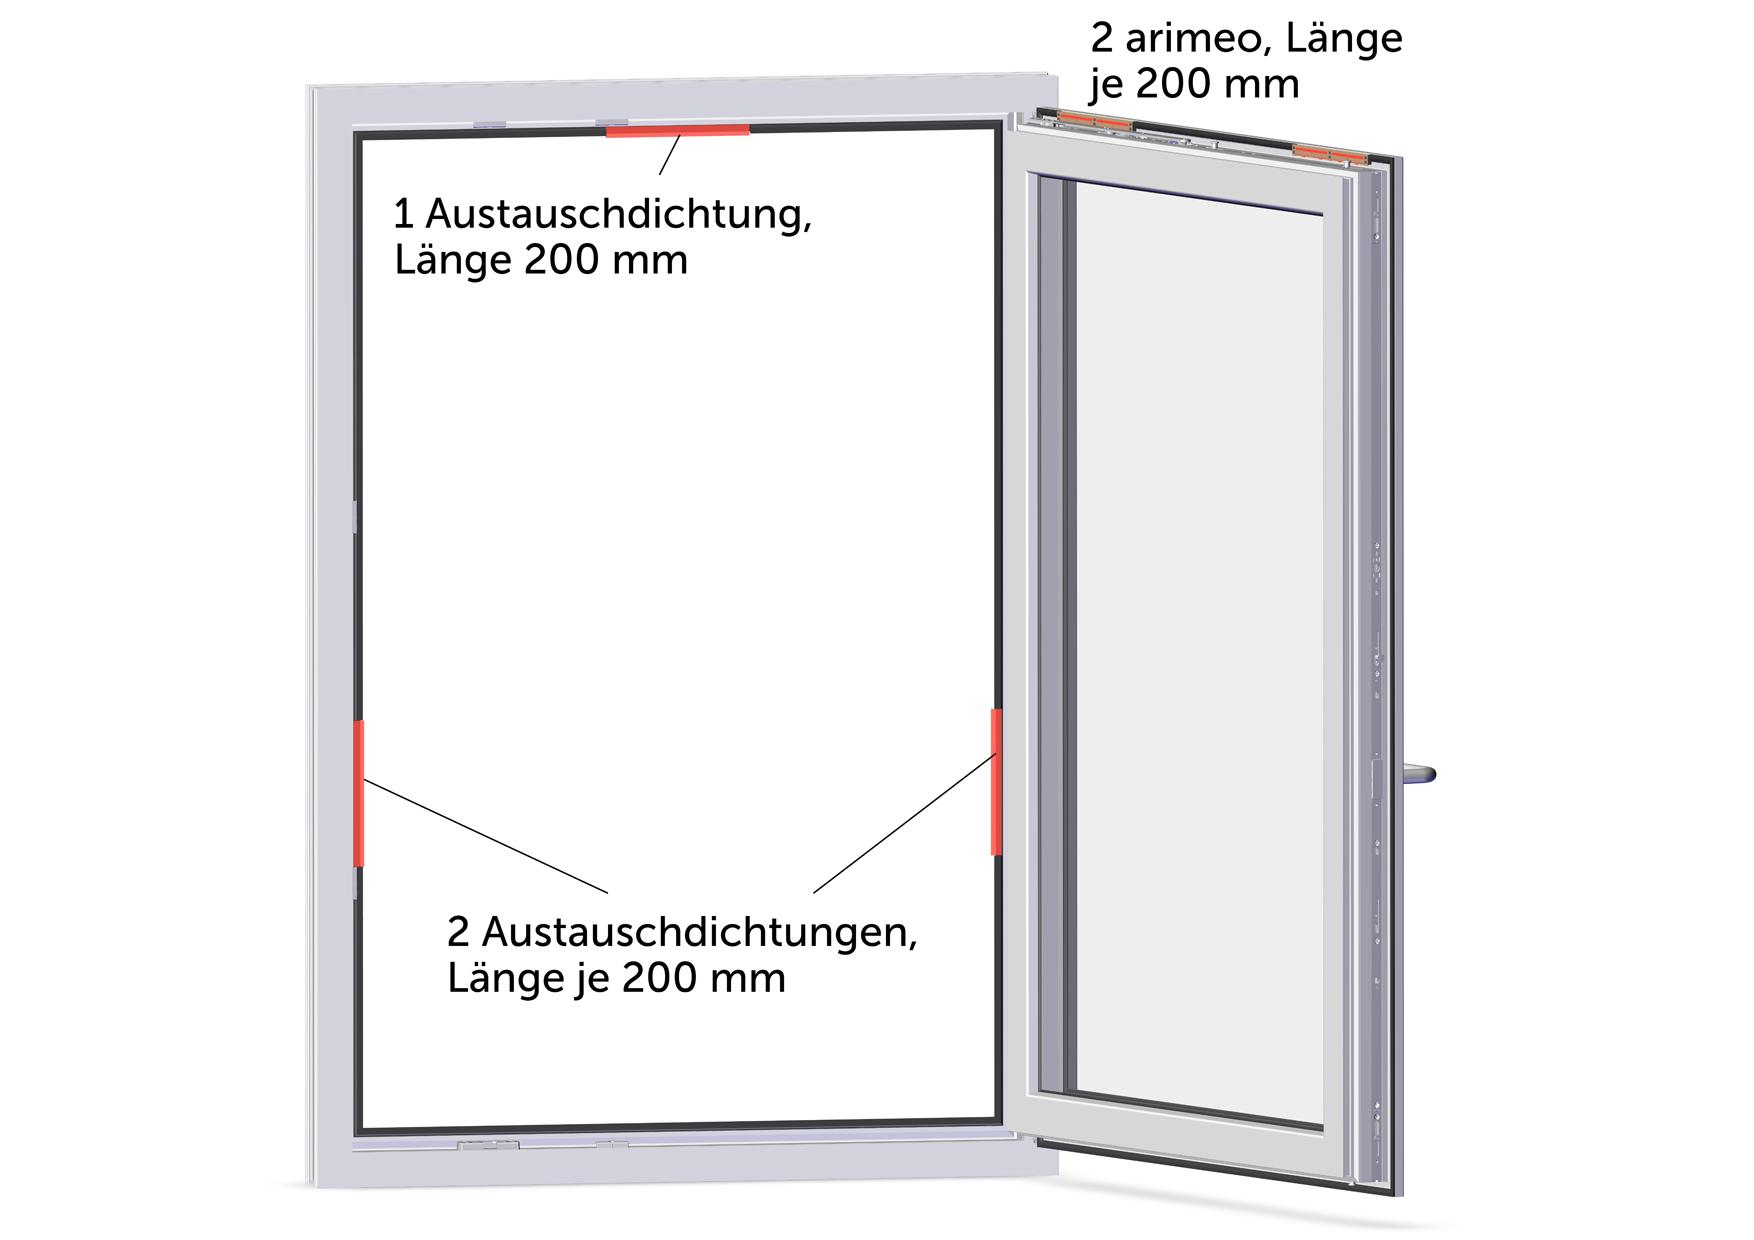 arimeo classic S Fensterfalzlüfter Einbauvariante double